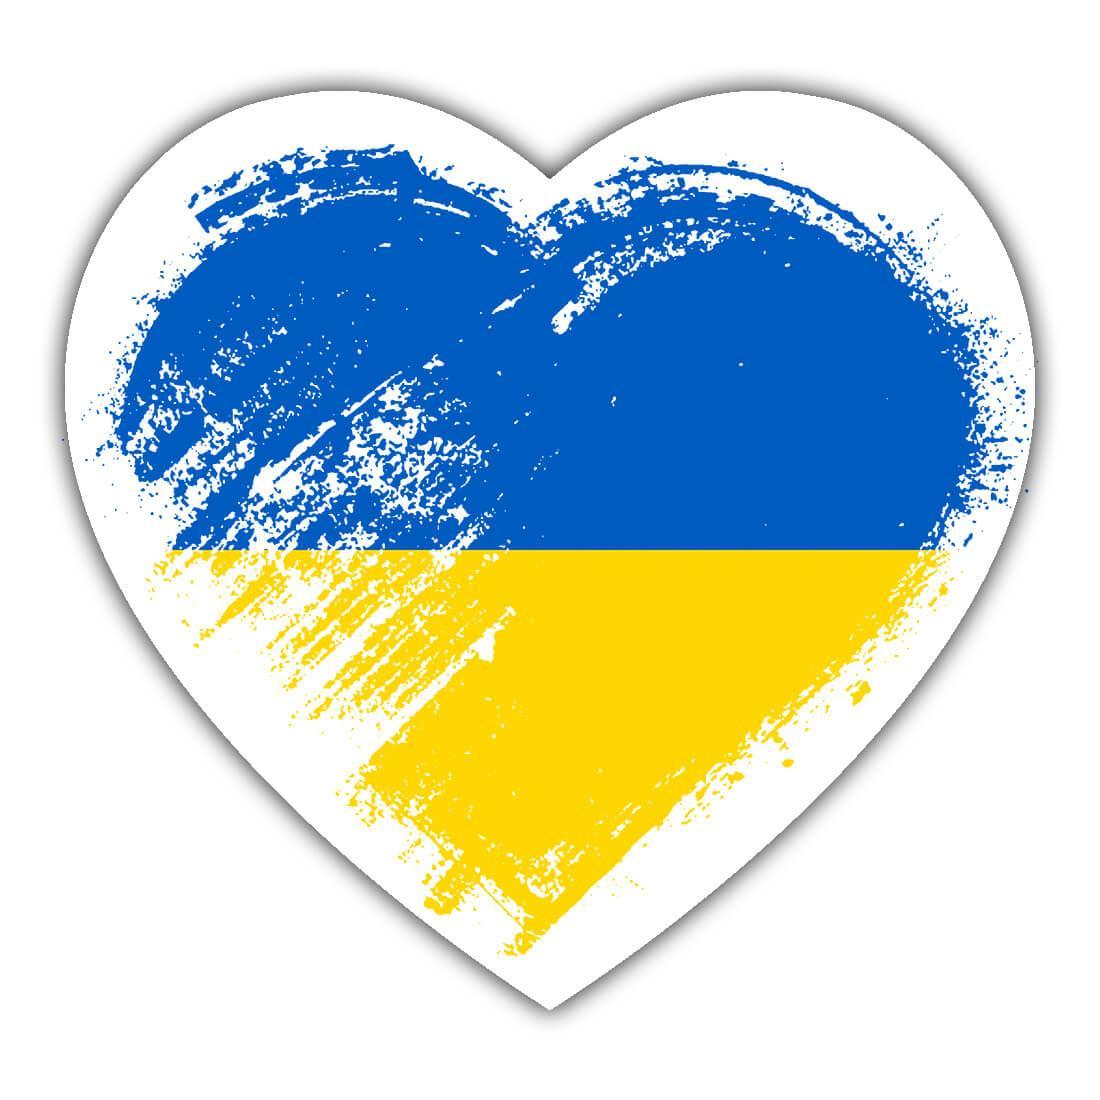 Ukrainian Heart : Gift Sticker Ukraine Country Expat Flag Patriotic Flags National